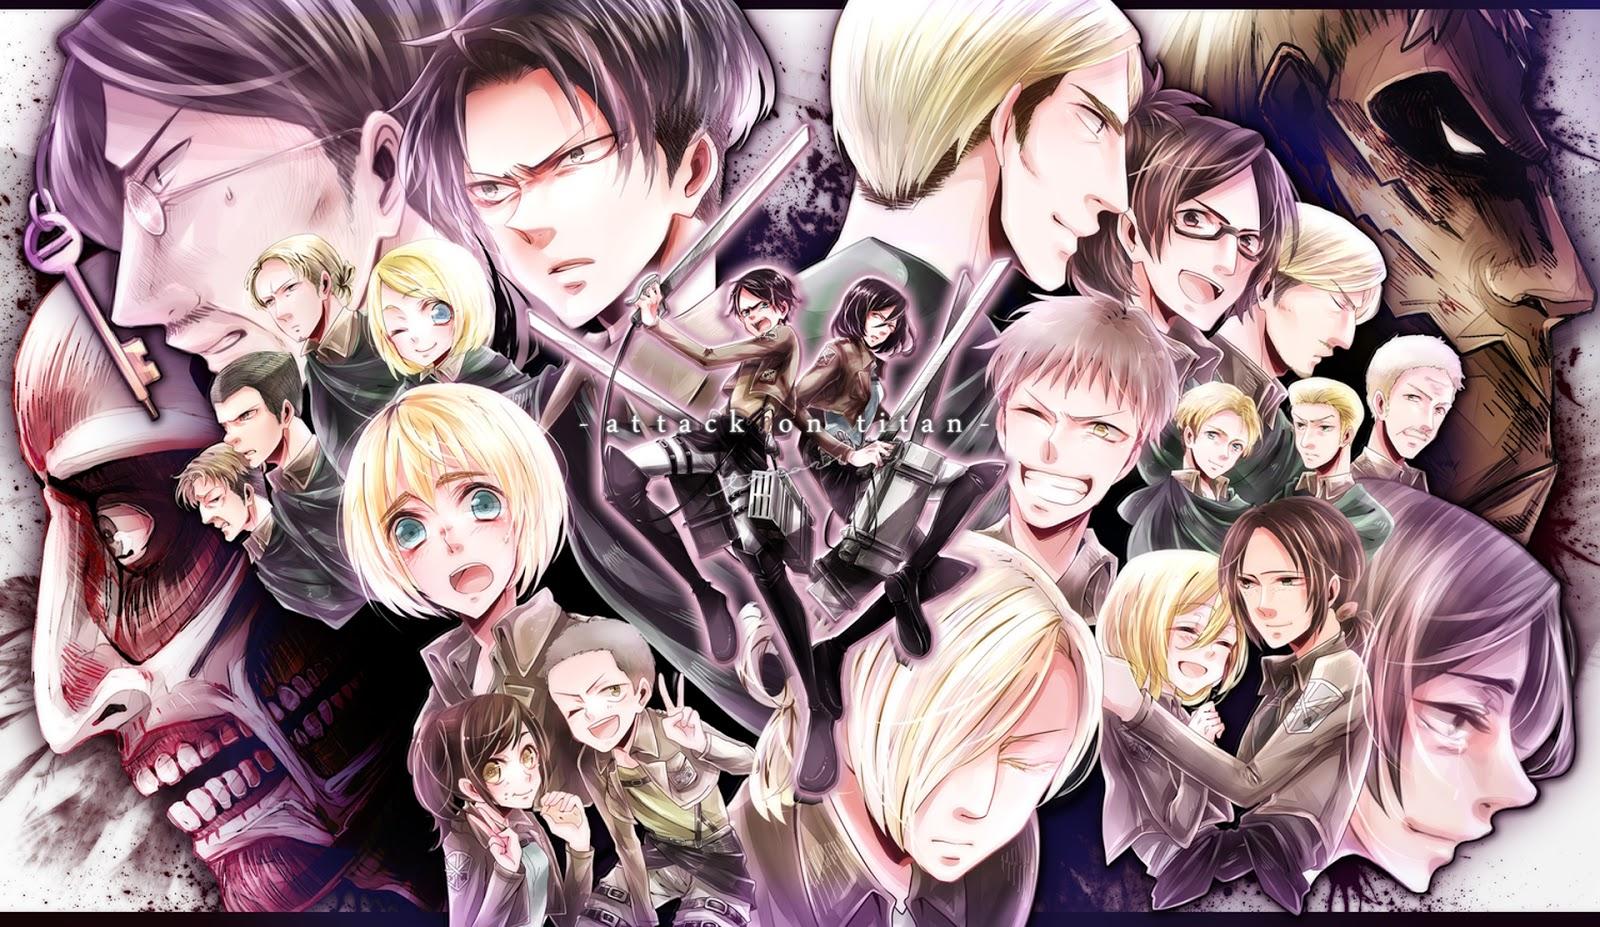 Attack on Titan Shingeki no Kyojin Character Group Anime HD Wallapper 1600x927